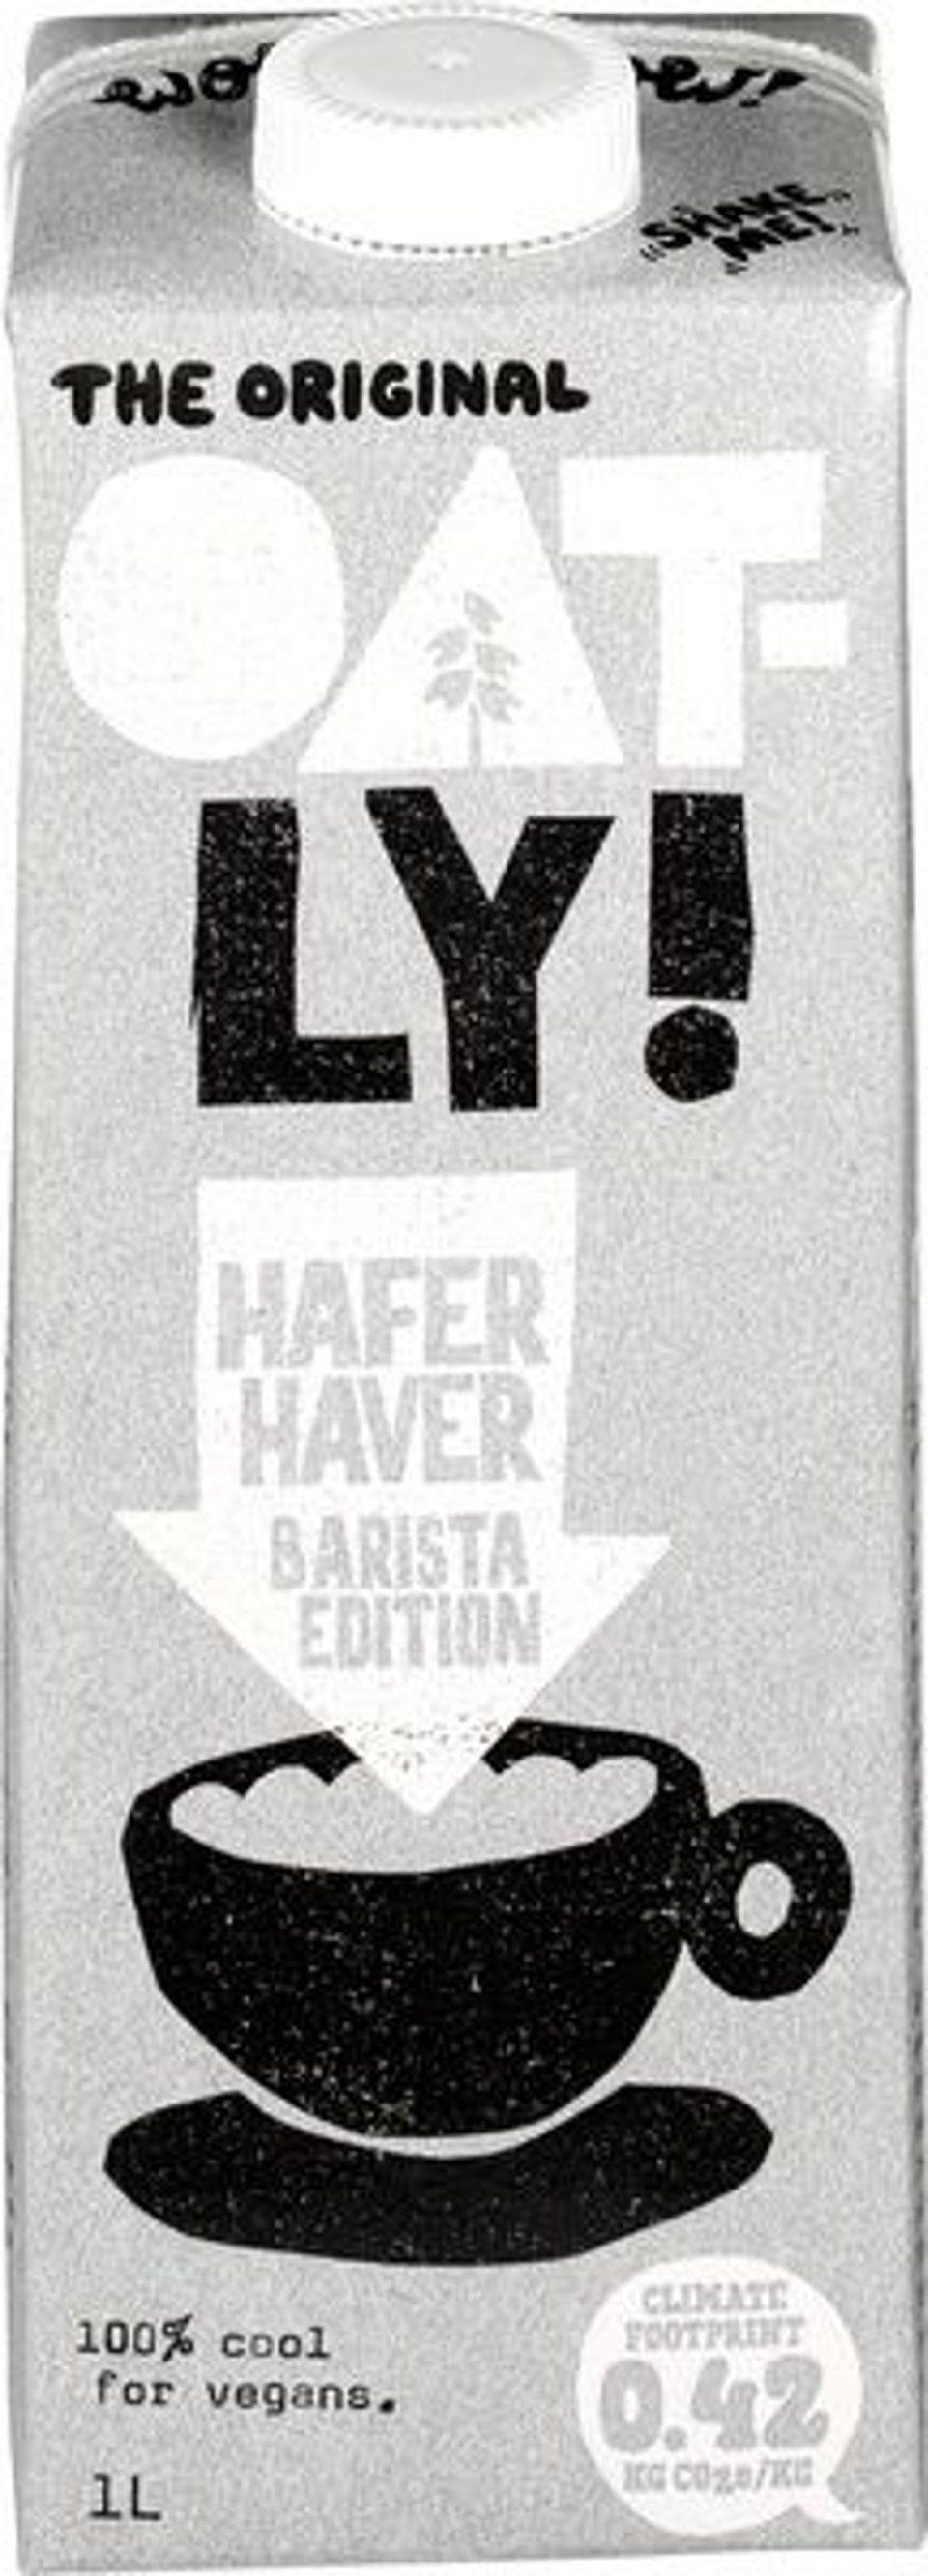 Oatly! Haverdrank barista editon